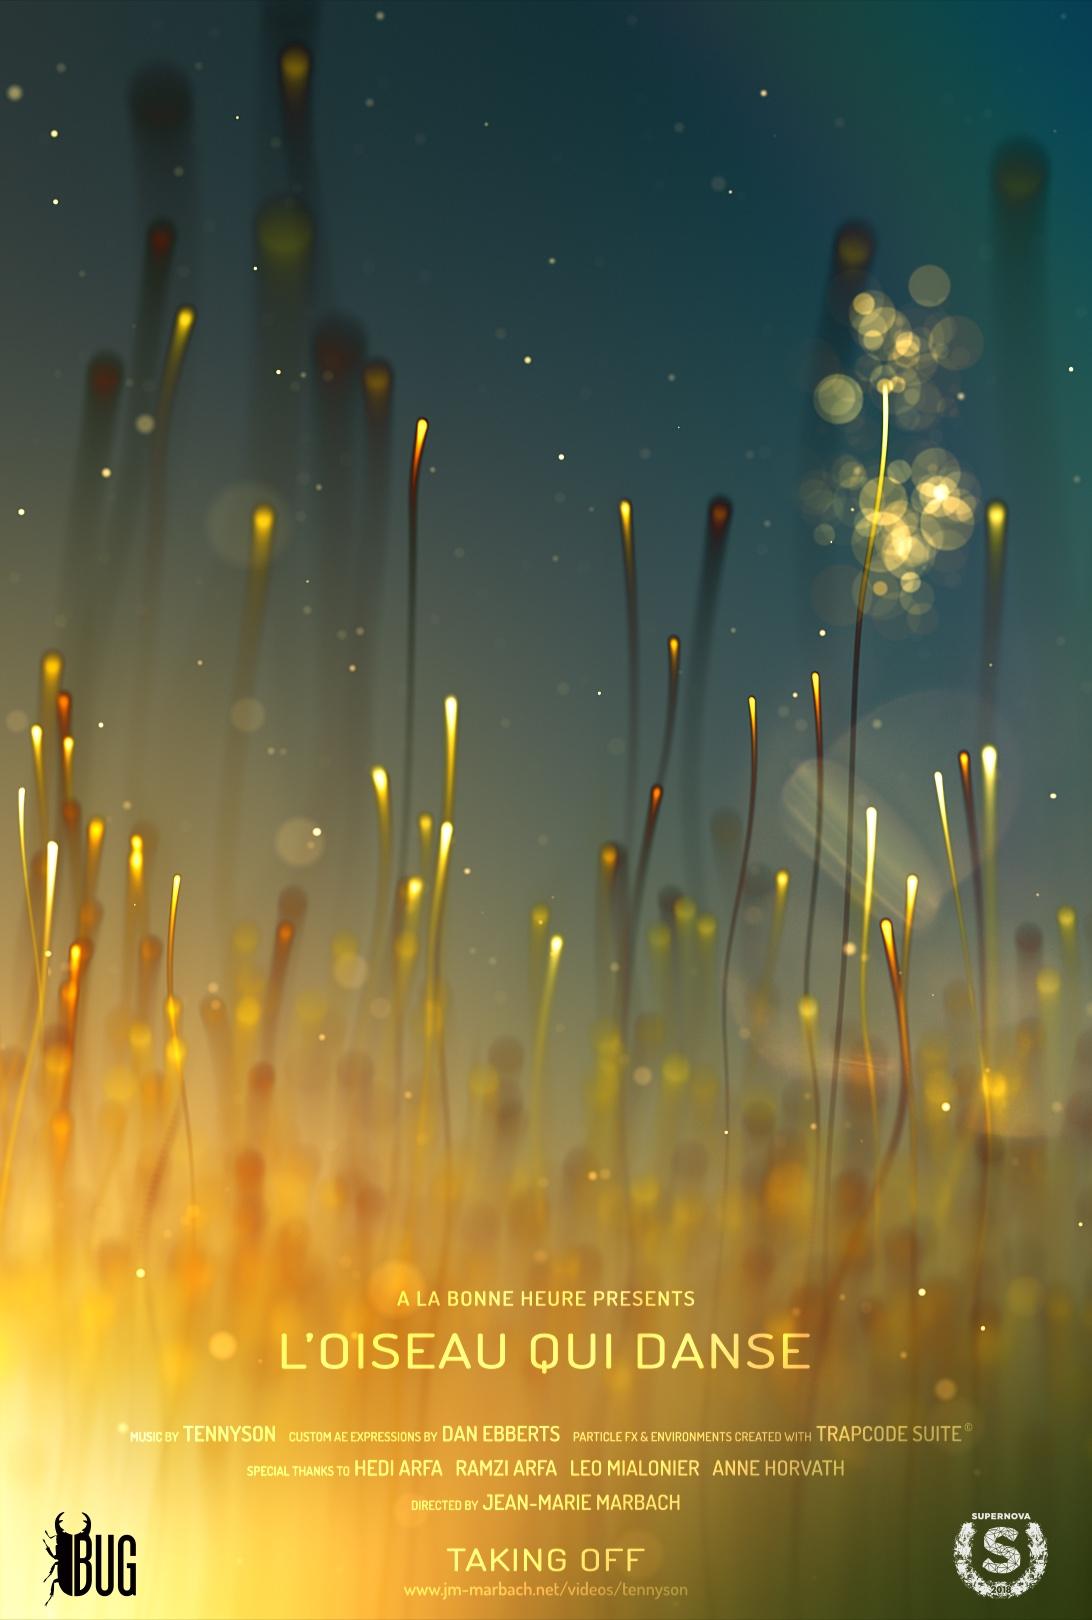 Tennyson_L'oiseau_qui_danse_poster.